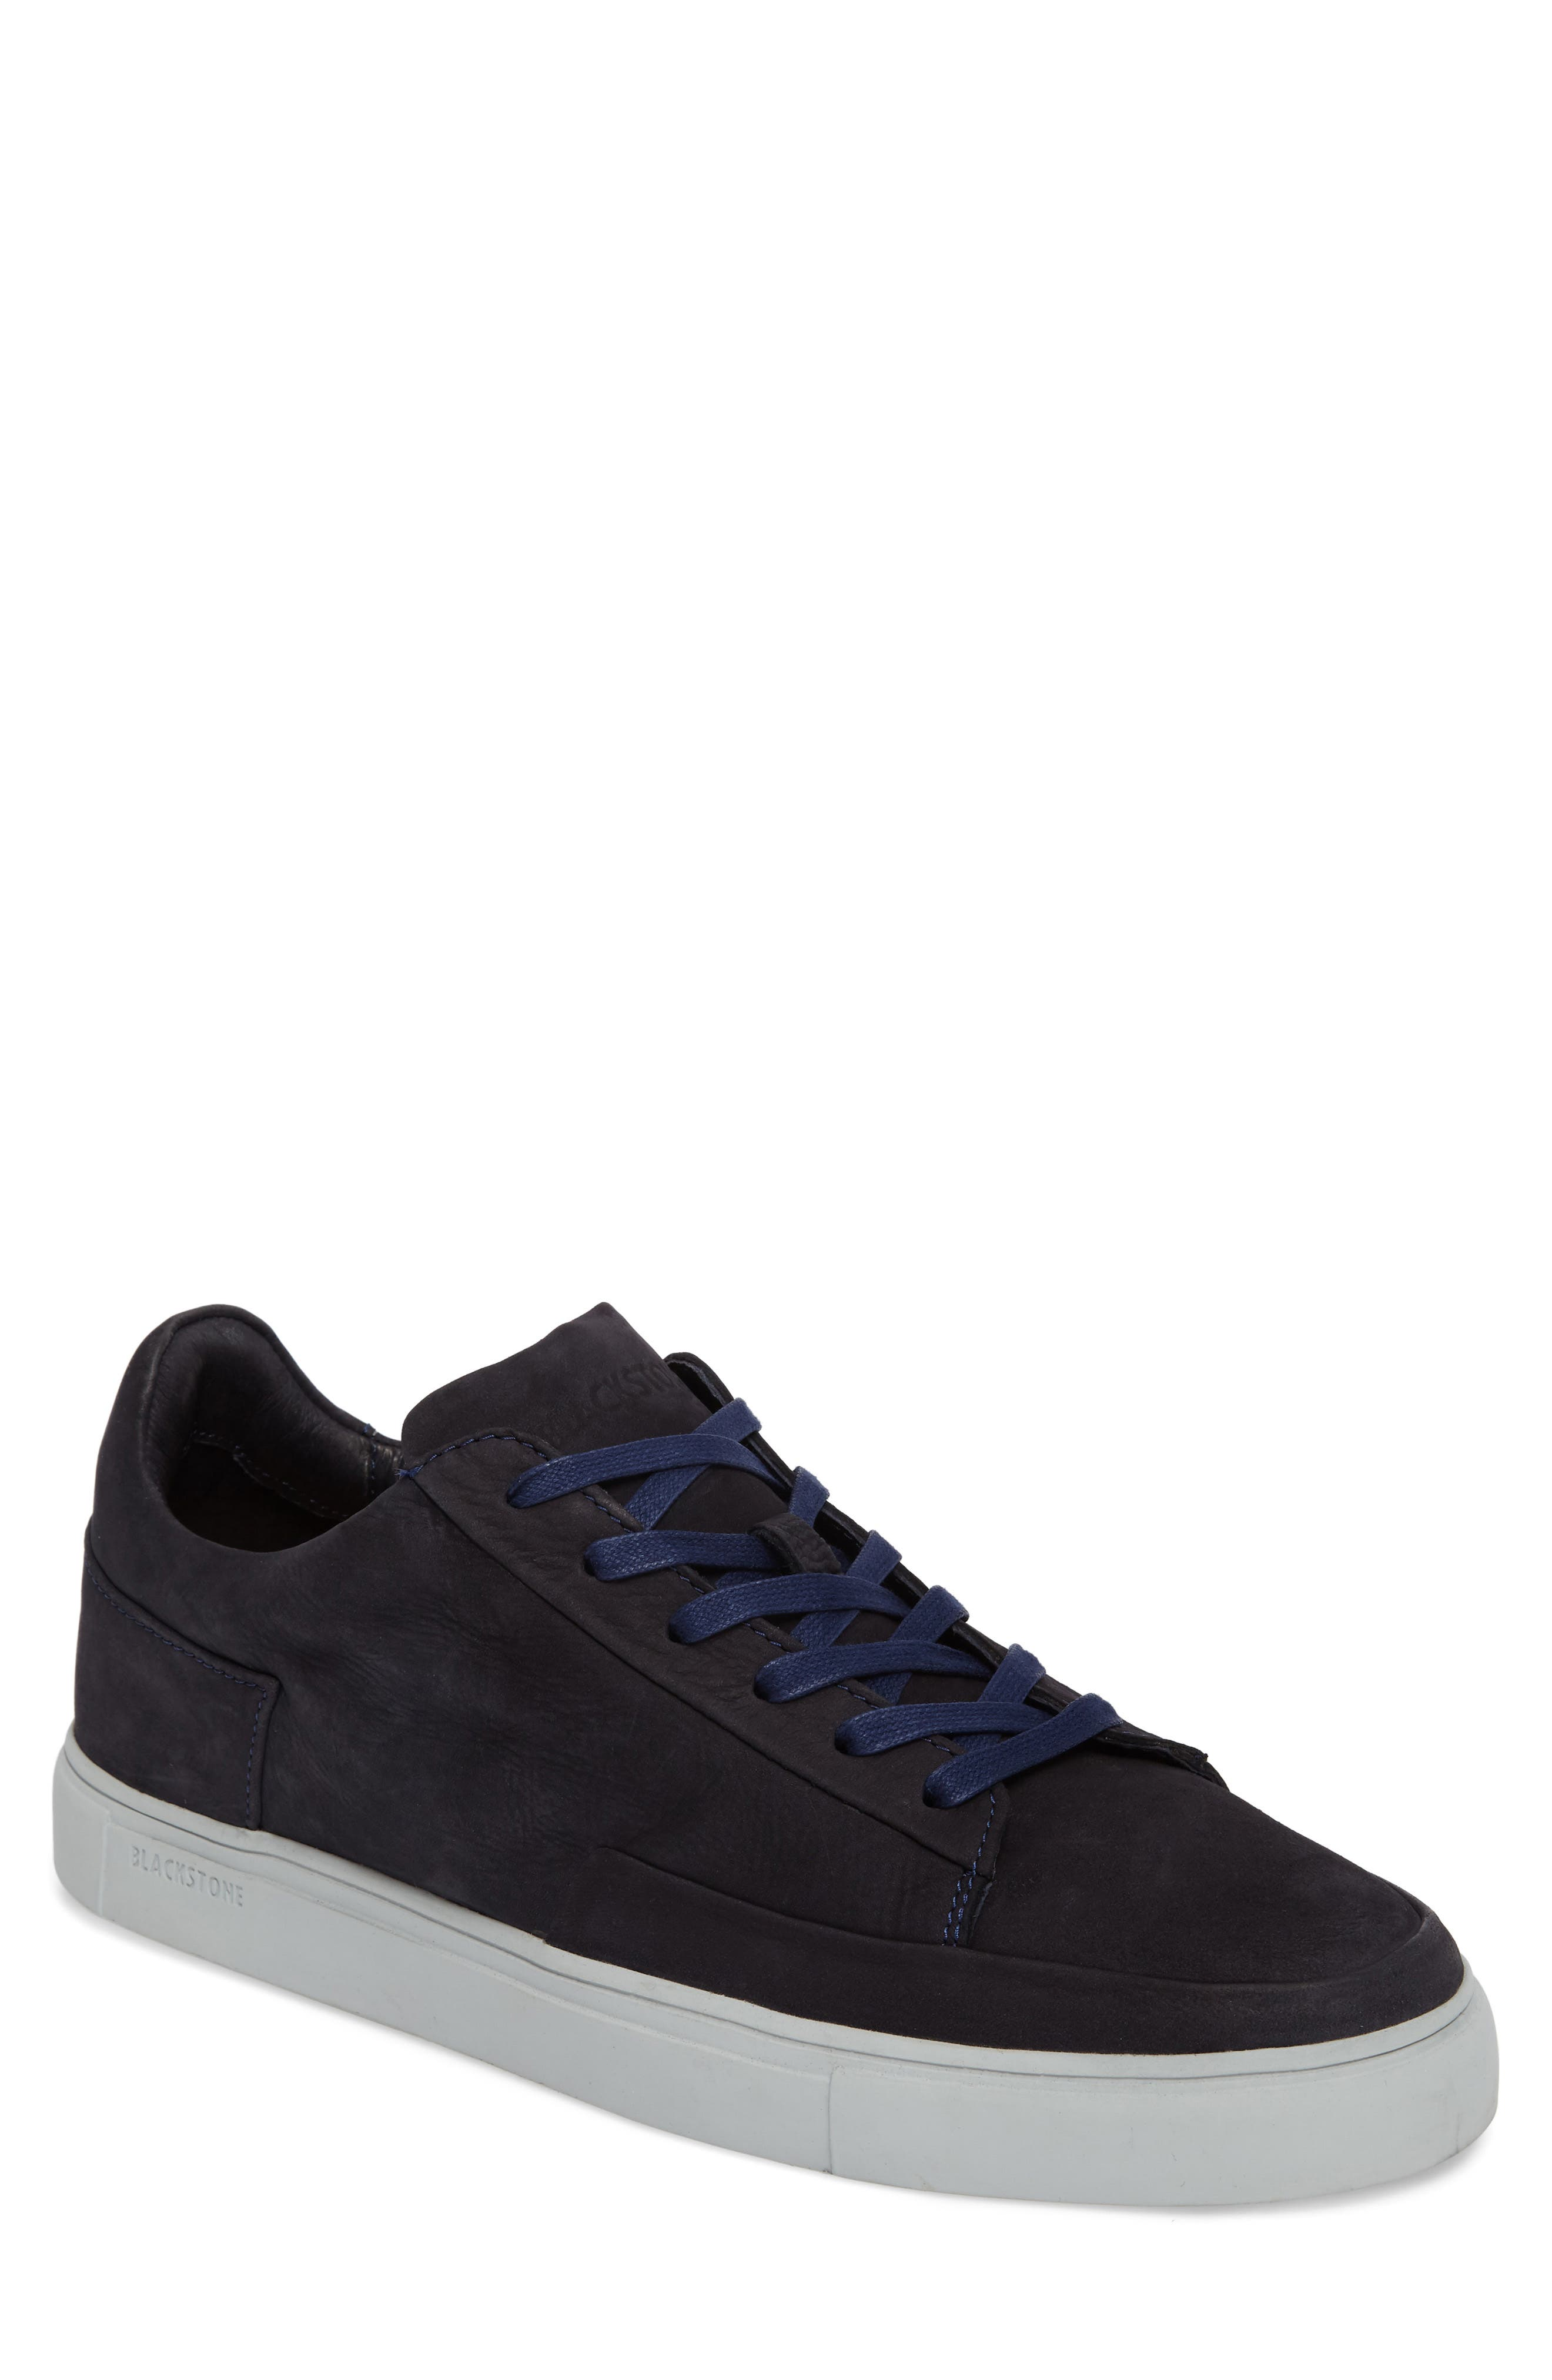 BLACKSTONE 'KM01' Sneaker